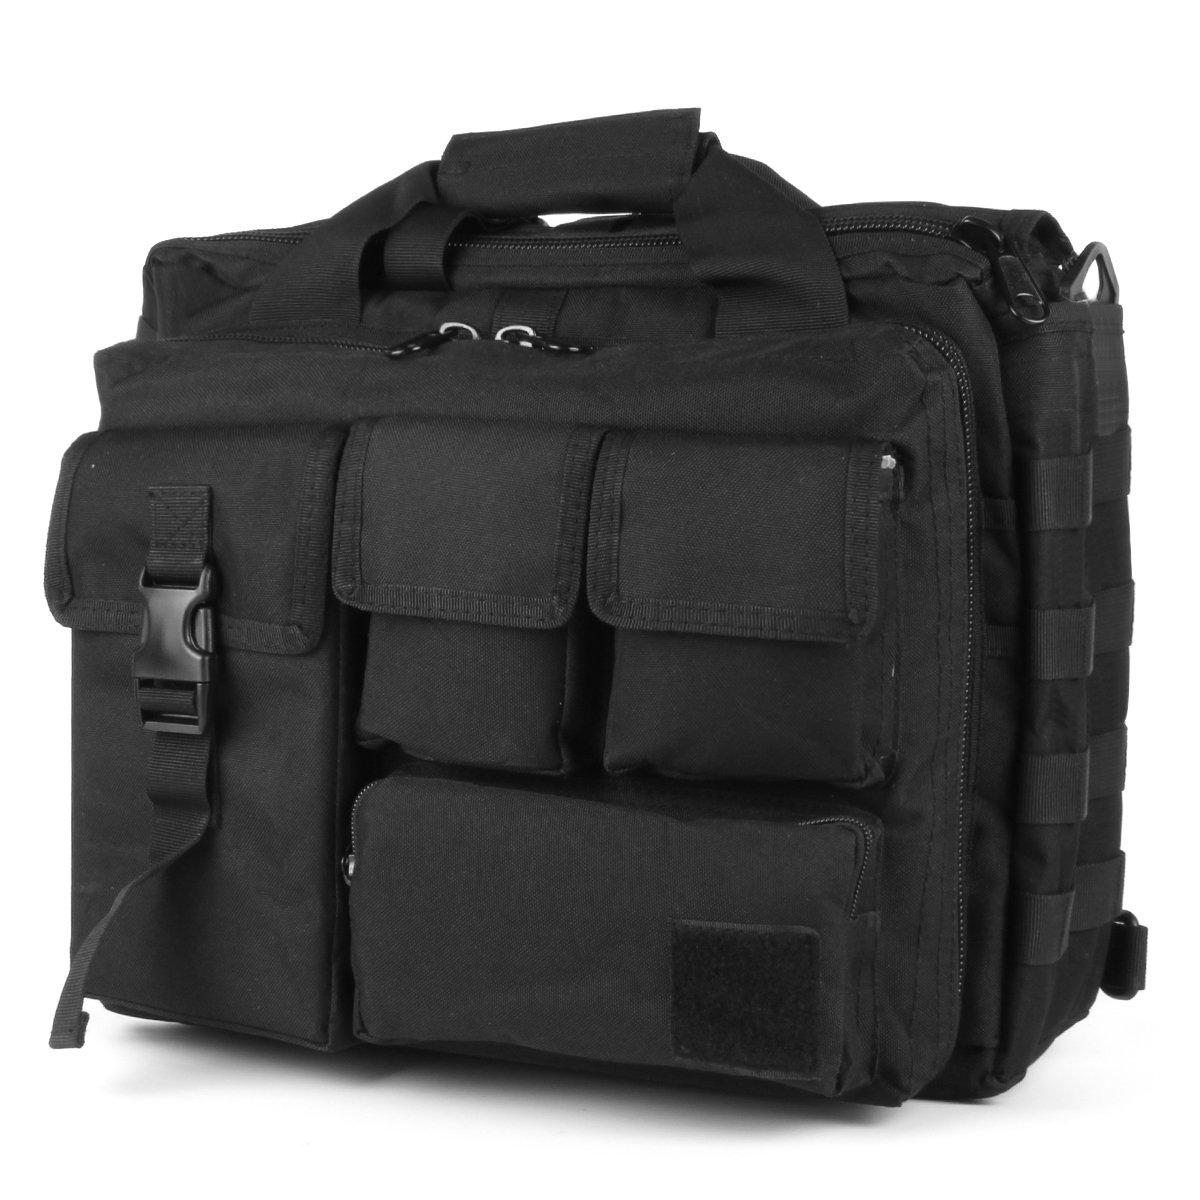 GES Multifunction Mens Outdoor Tactical Nylon Shoulder Laptop Messenger Bag Briefcase Handbags Large Enough for 15.6'' Laptop/Camera (Black)